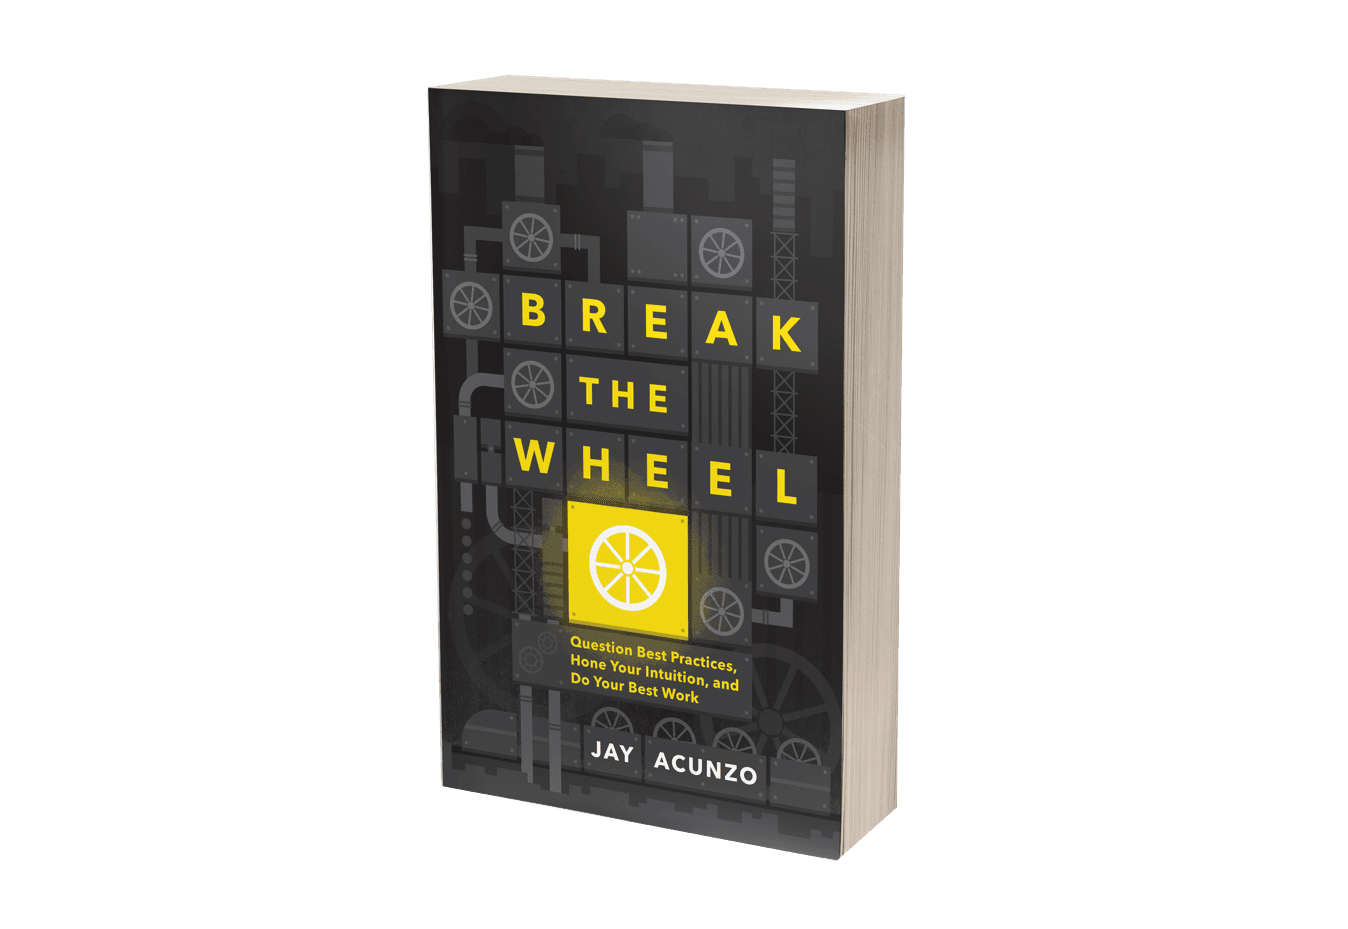 Break-the-Wheel-by-Jay-Acunzo-blog.png